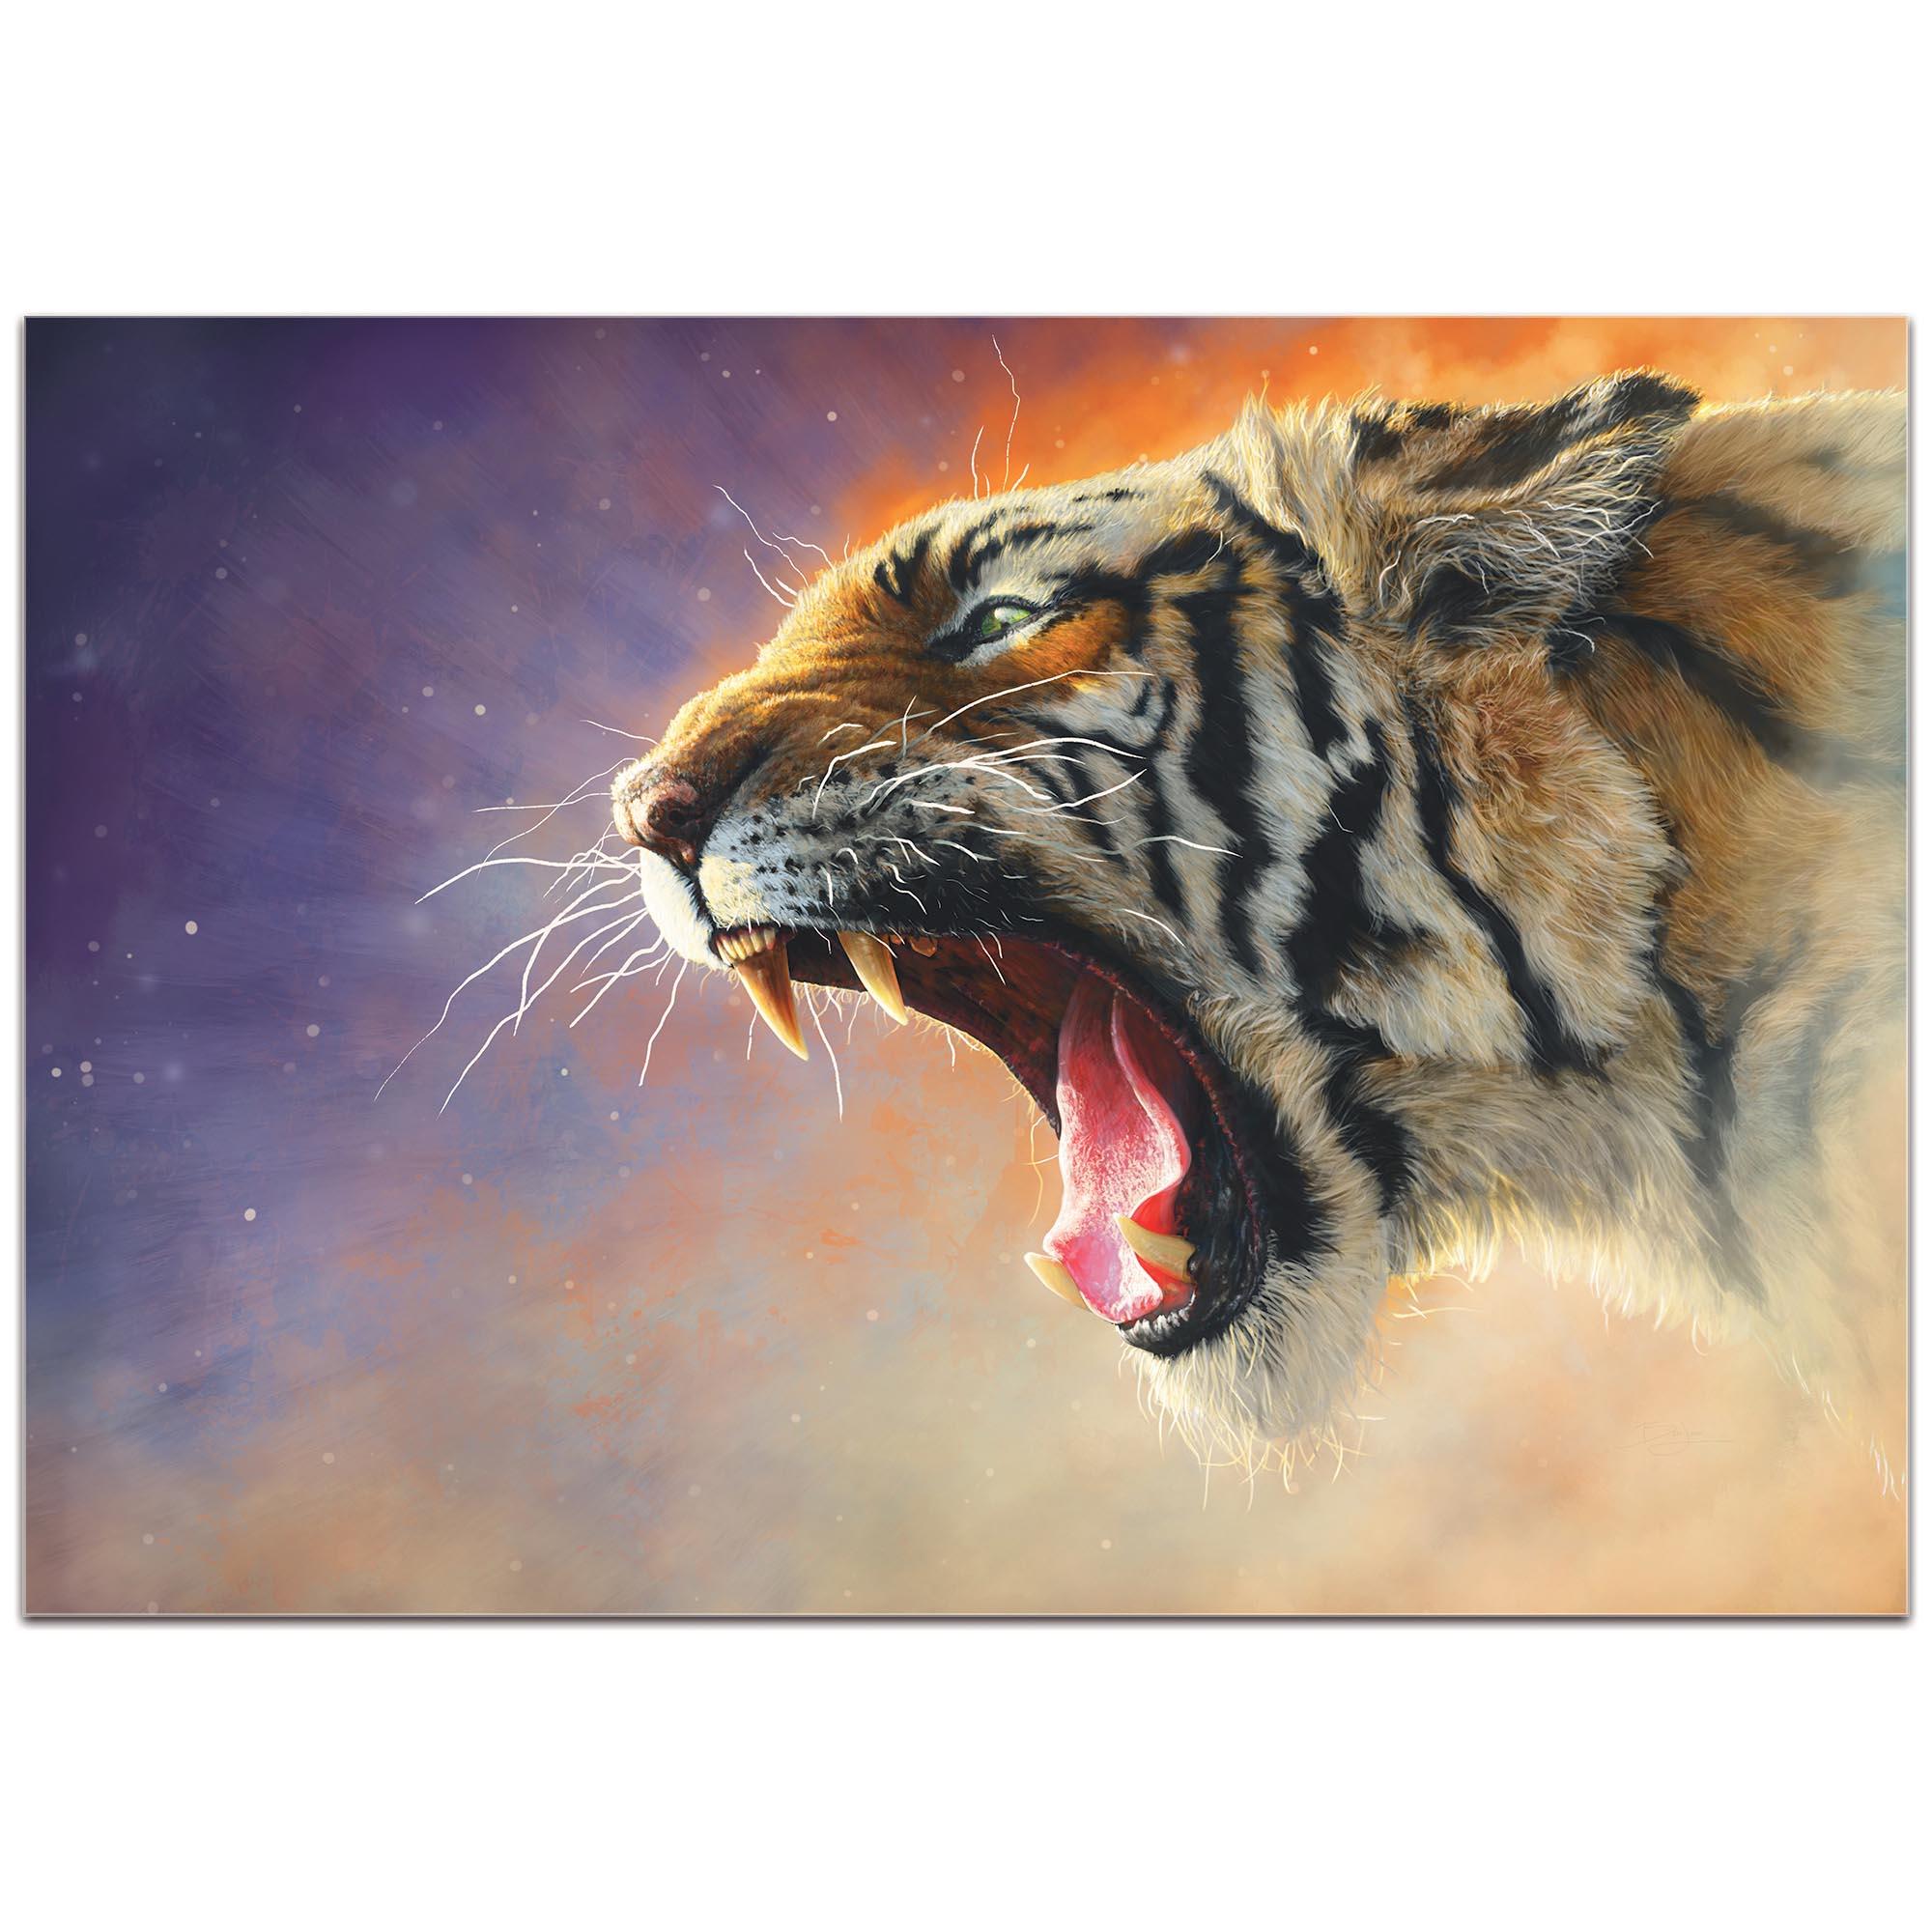 Expressionist Wall Art 'Fear Me' - Wildlife Decor on Metal or Plexiglass - Image 2